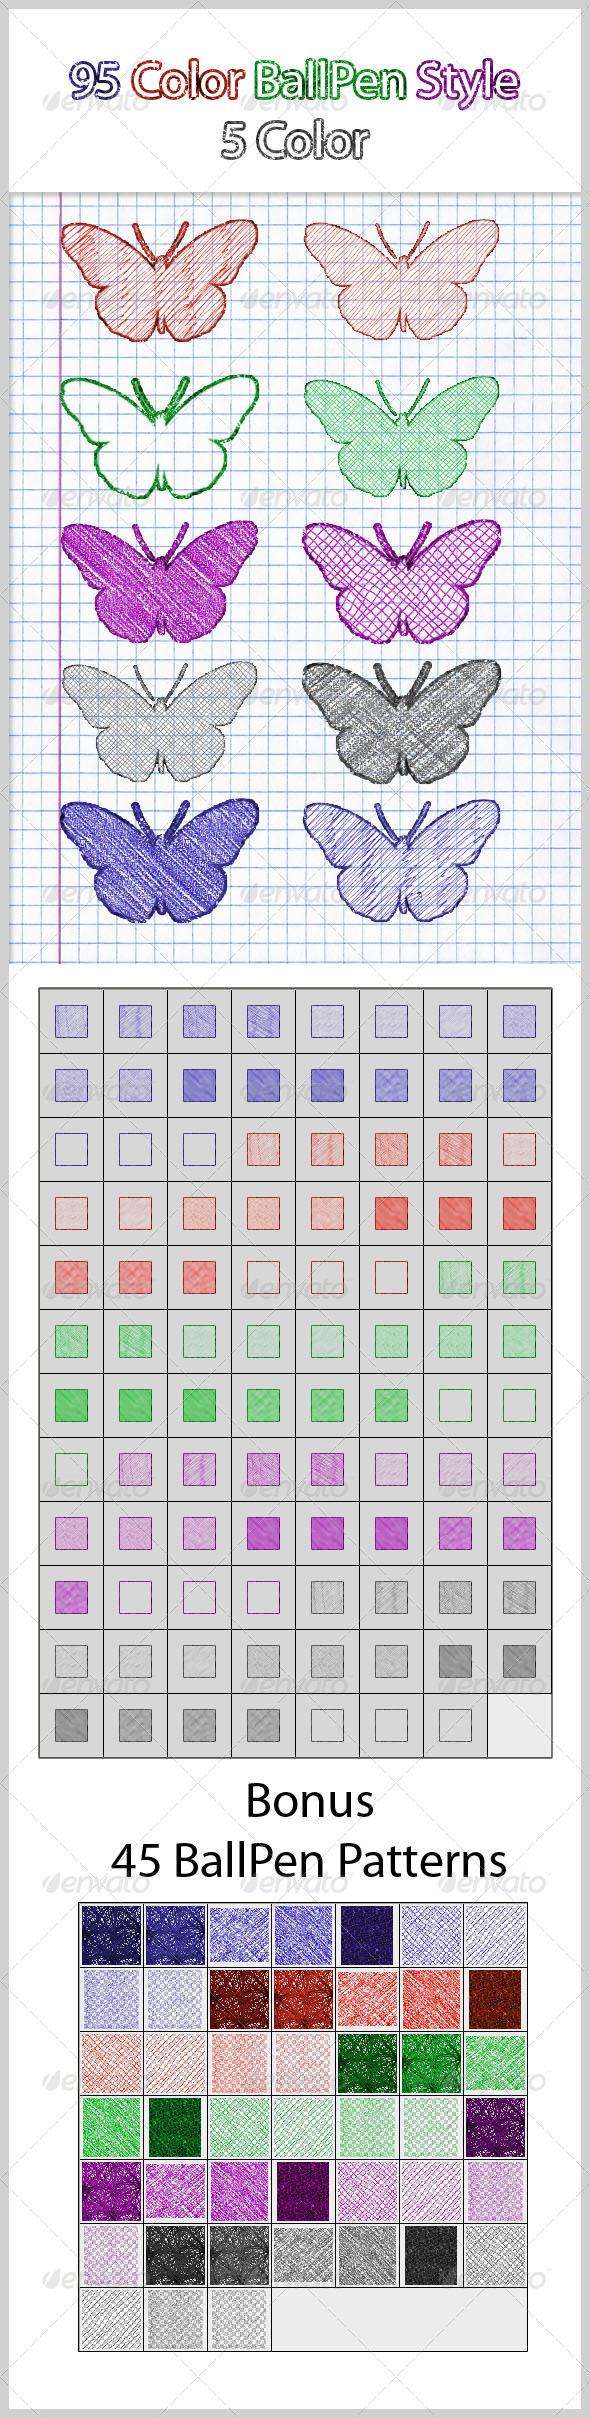 95 Color BallPen Style (5 Color) - Styles Photoshop